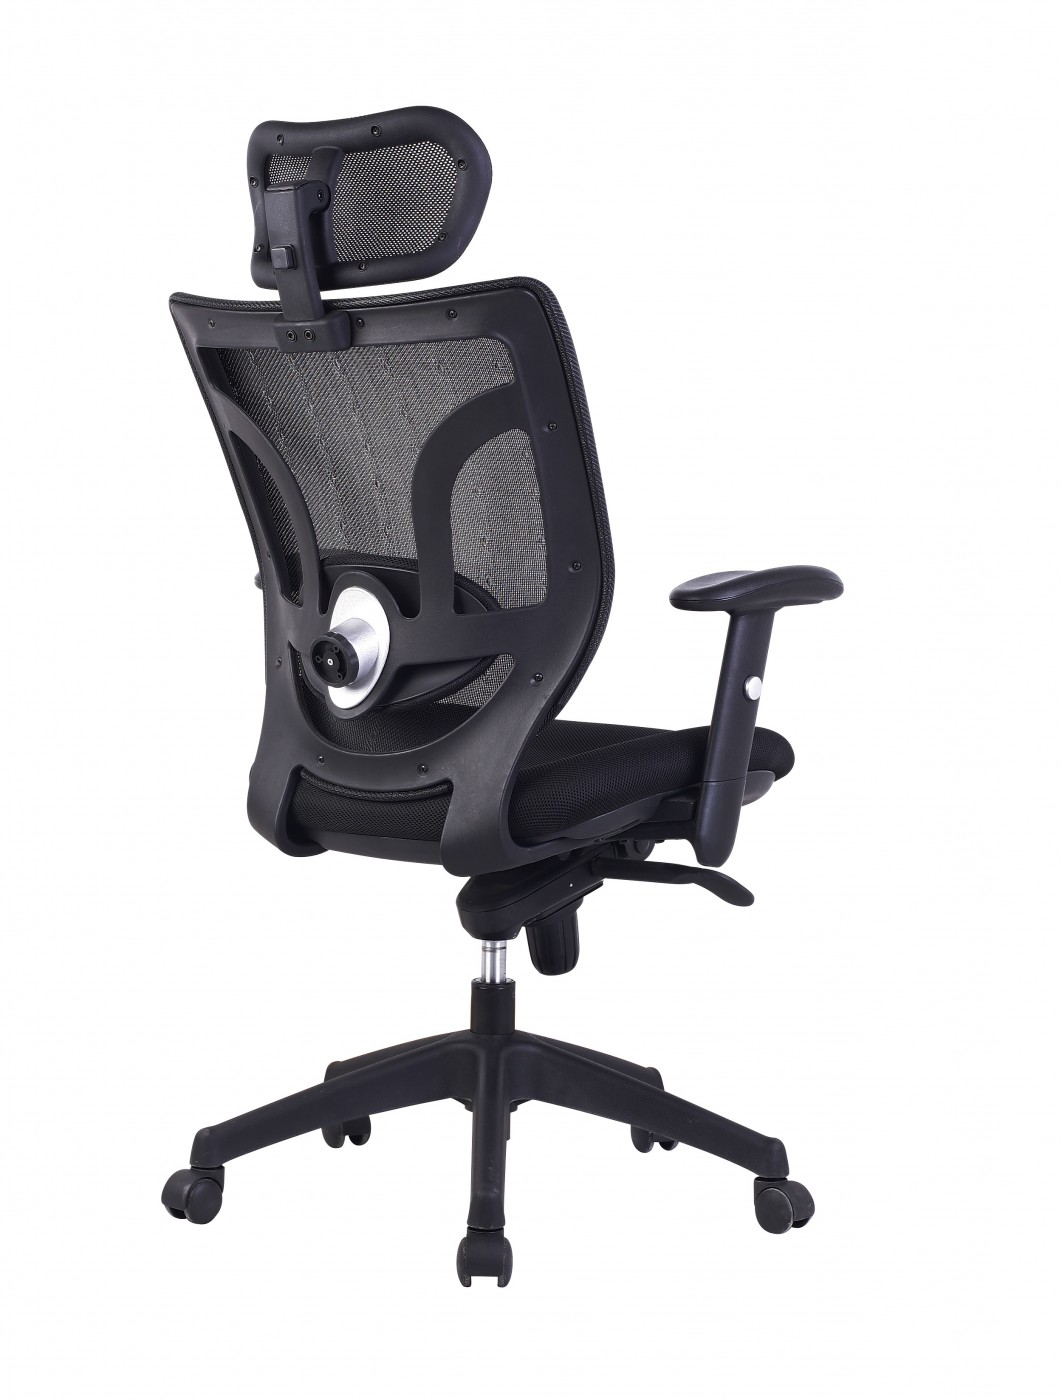 Mesh High Back Executive Chair BCM/K103/BK   Enlarged View